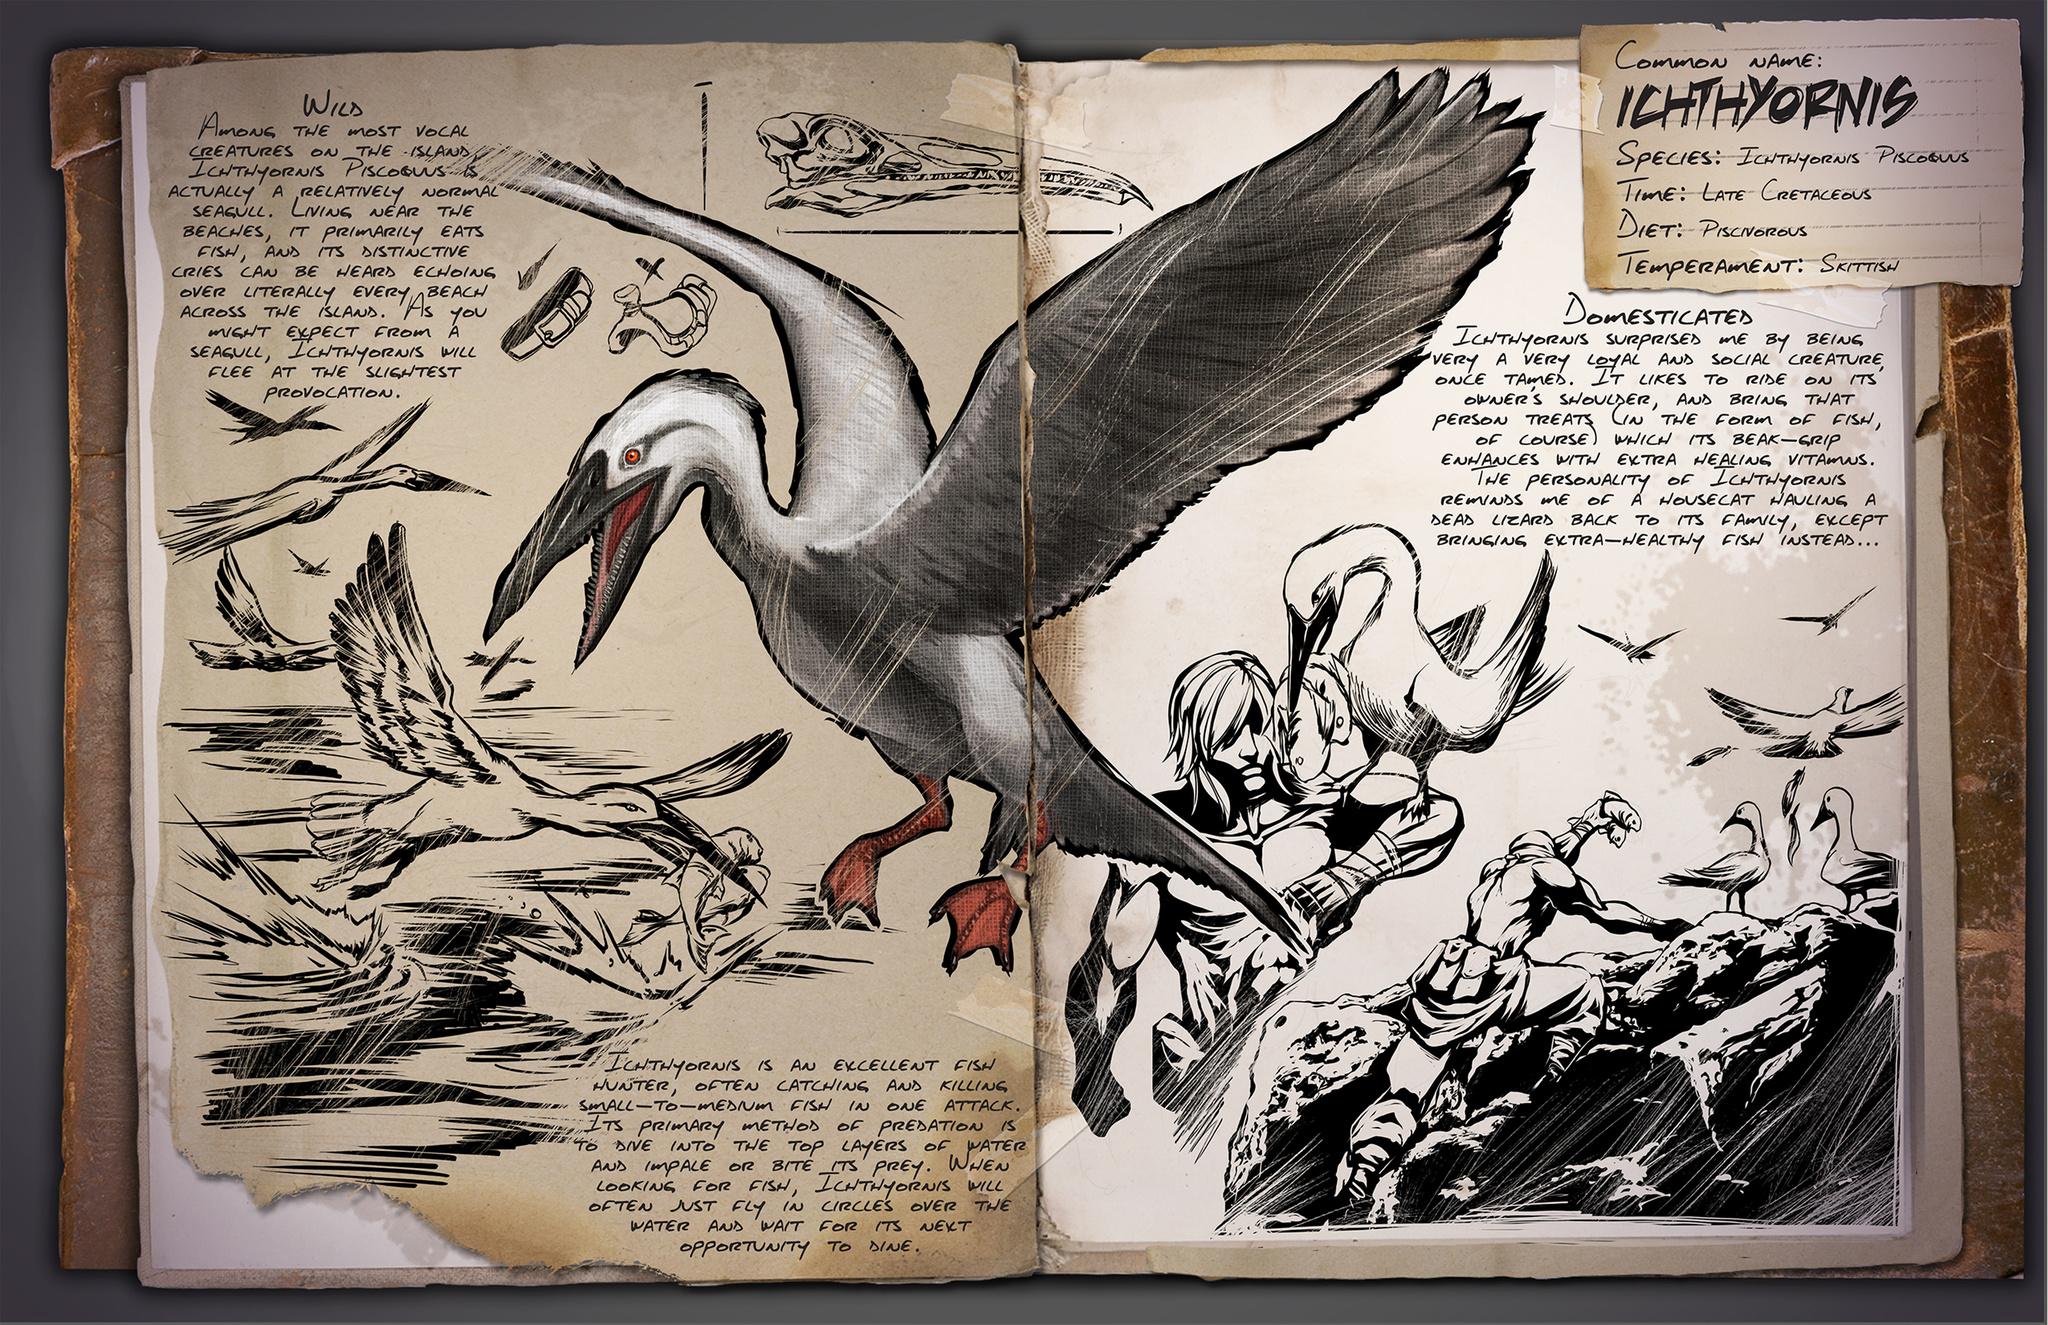 Dino Dossier: Ichthyornis